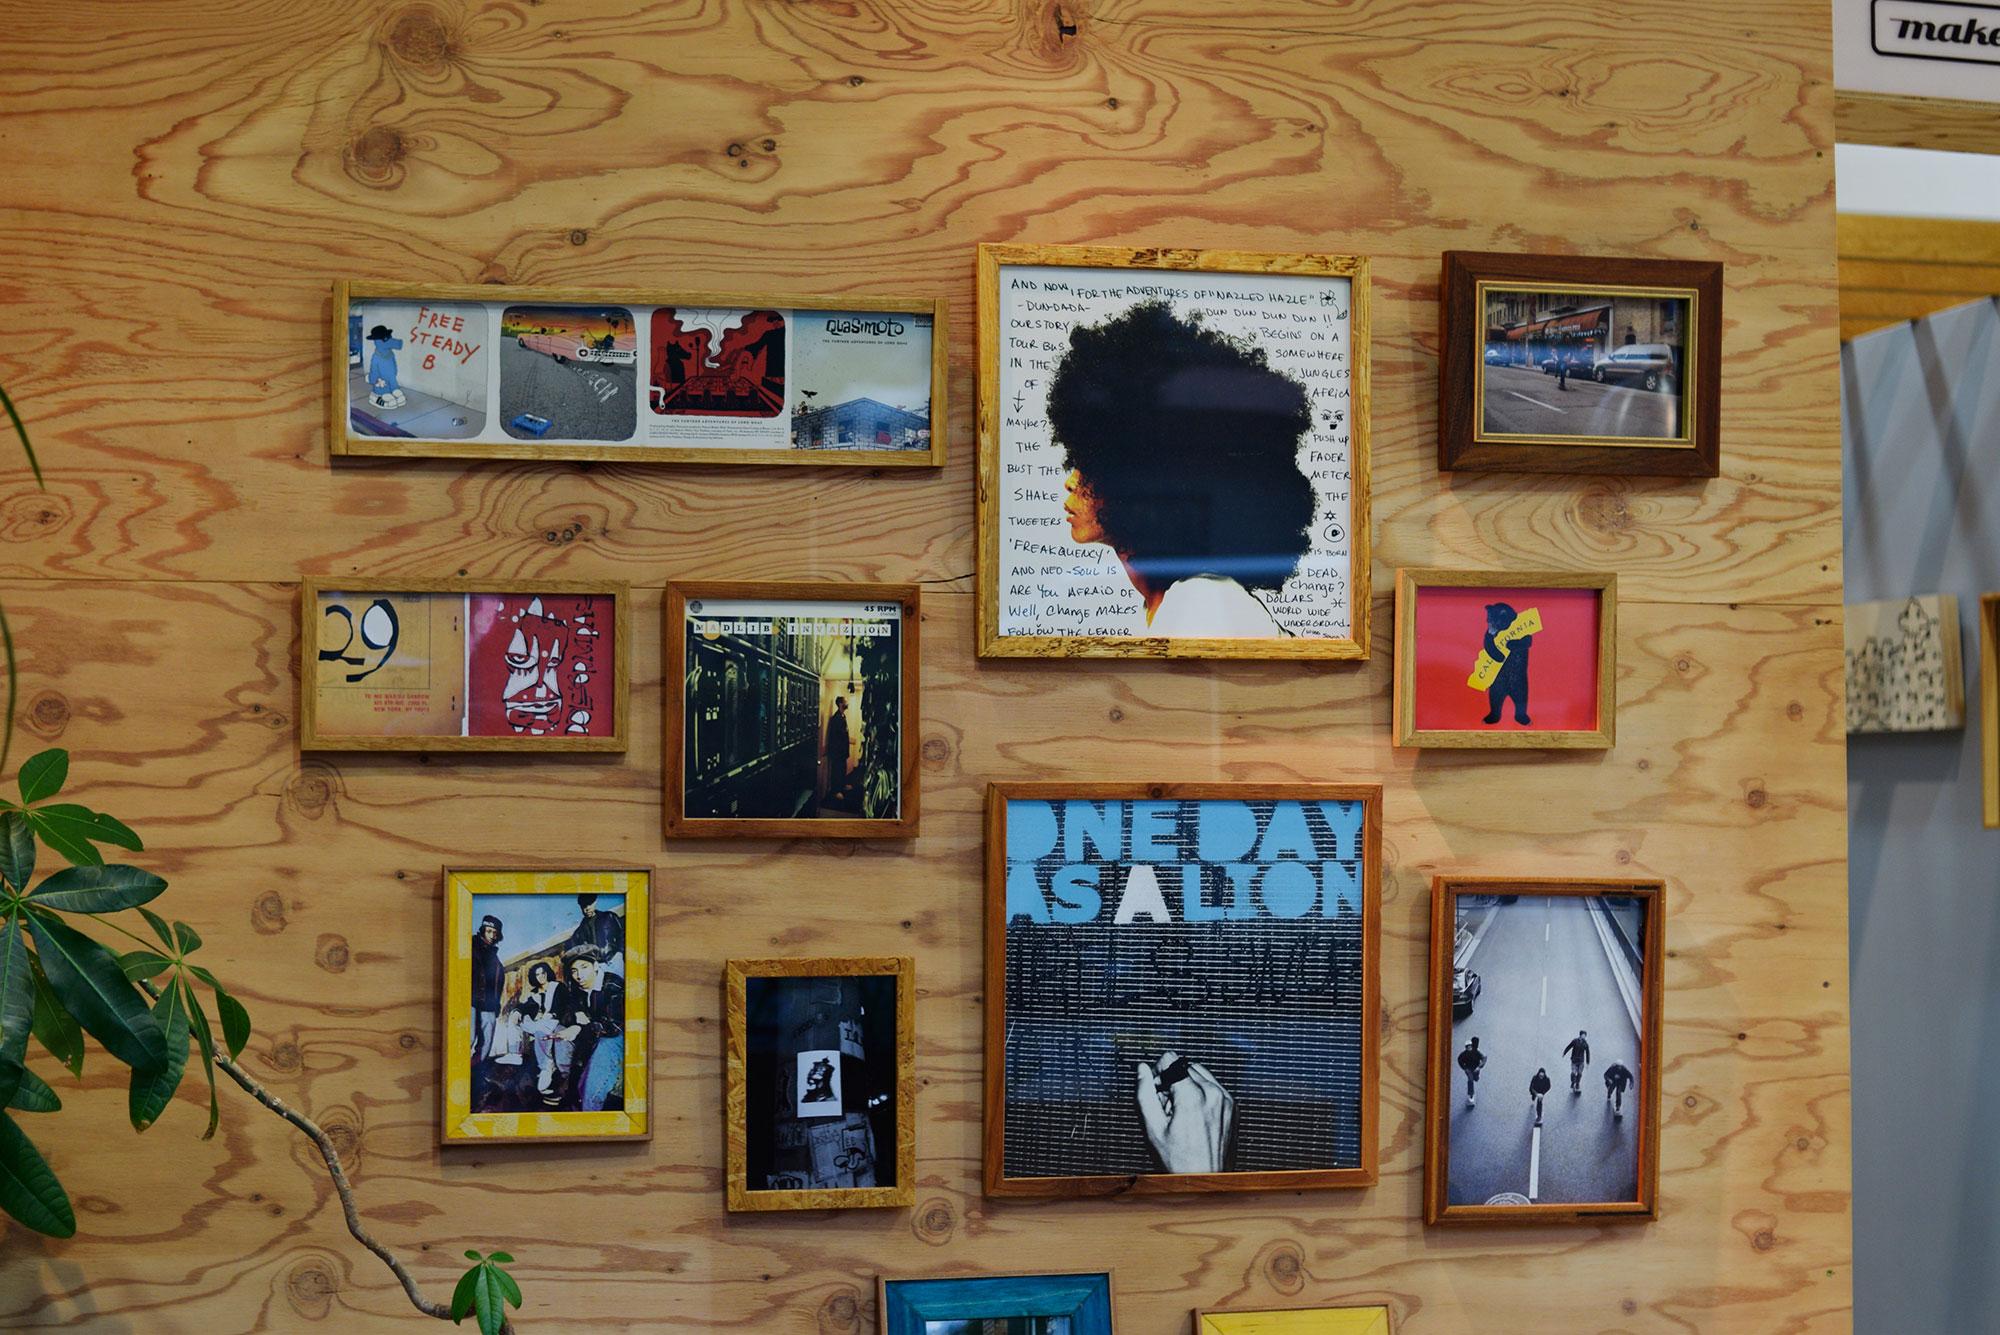 『Depth CRAFT Frame works』で展示中の越田さんのフォトフレームとレコードフレーム